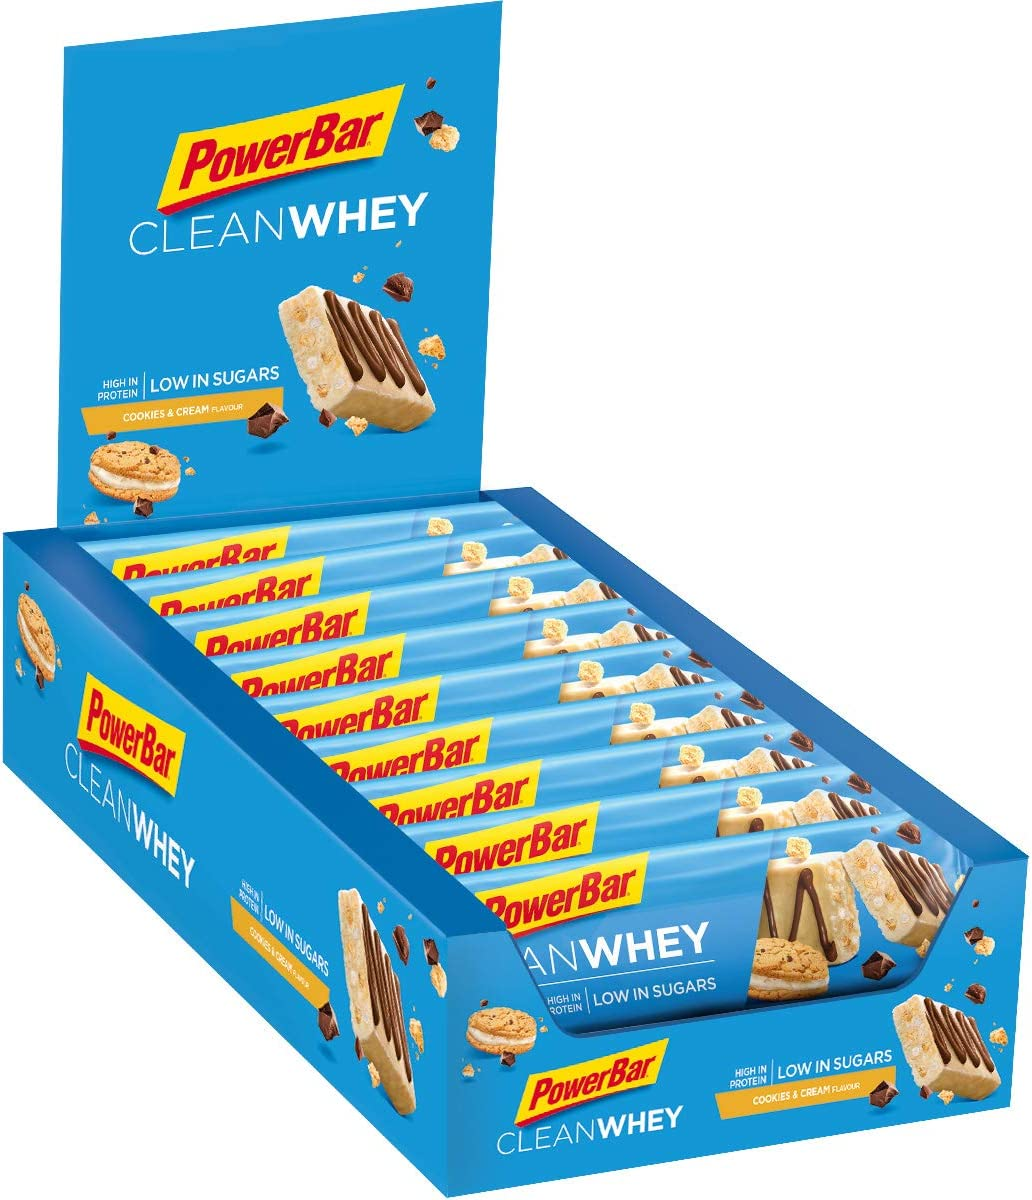 PowerBar Clean Whey Cookies&Cream 18x45g - Barras de Proteína con Bajo Contenido de Azúcar